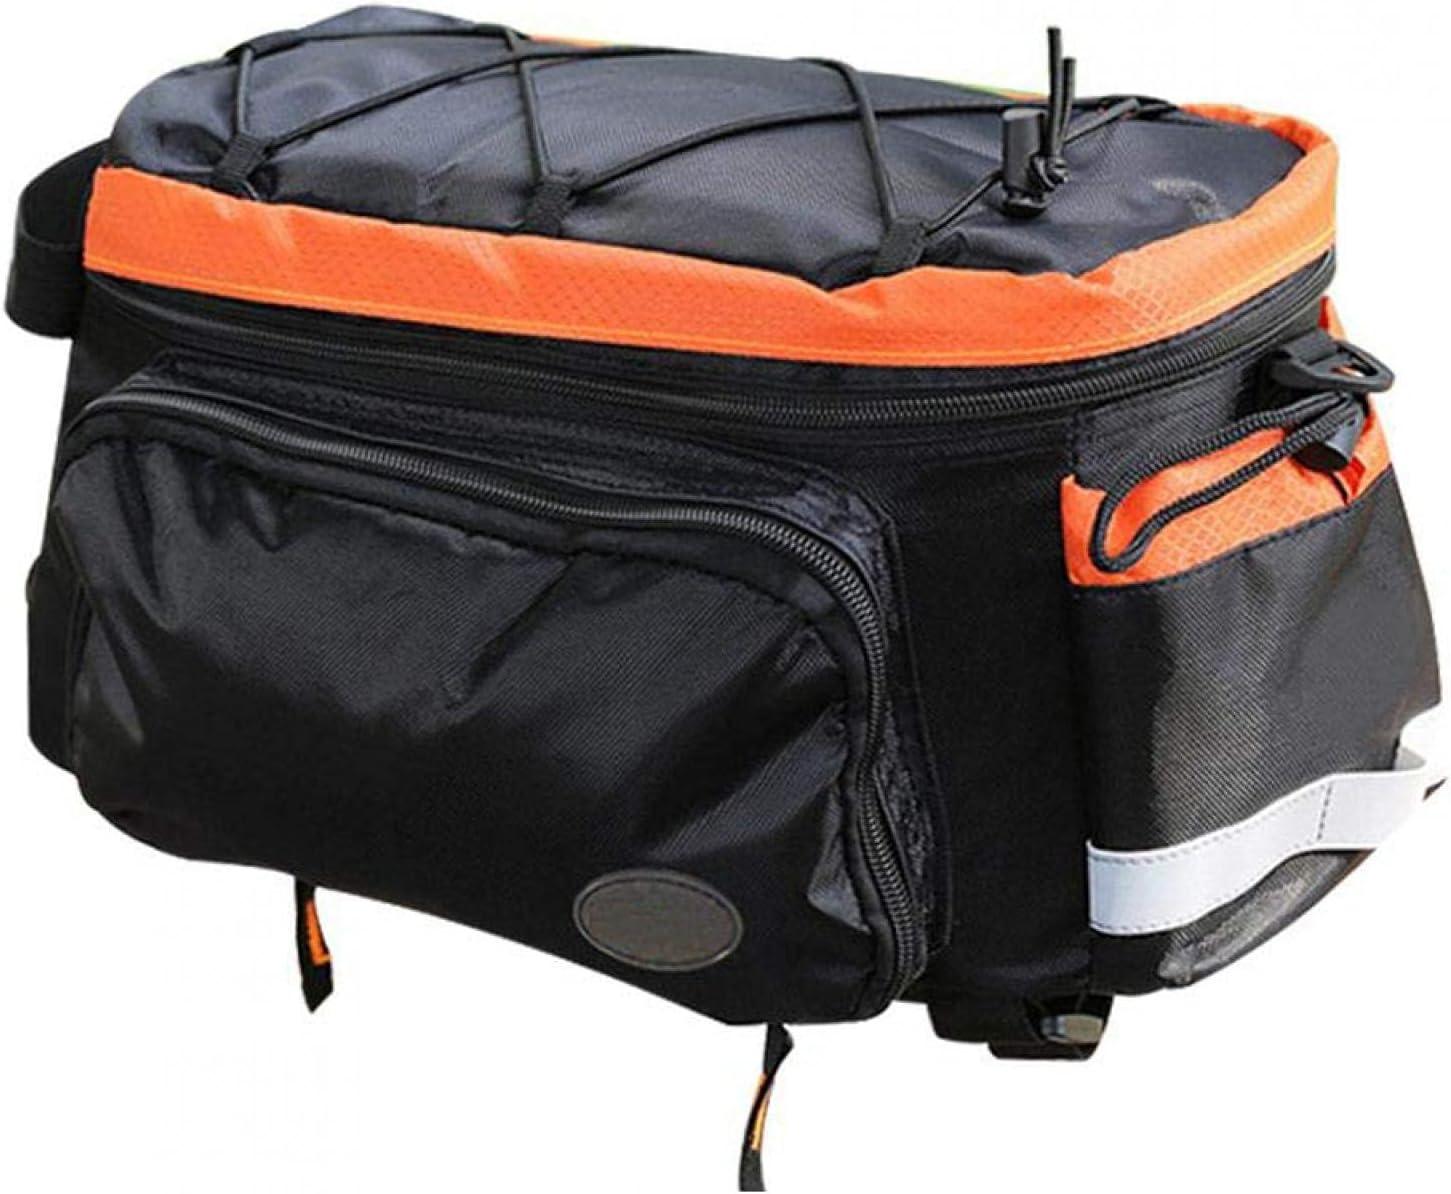 Dallas Mall Yuhoo New Shipping Free Cycling Rear Bag Bike Luggage Pannier Ra Storage